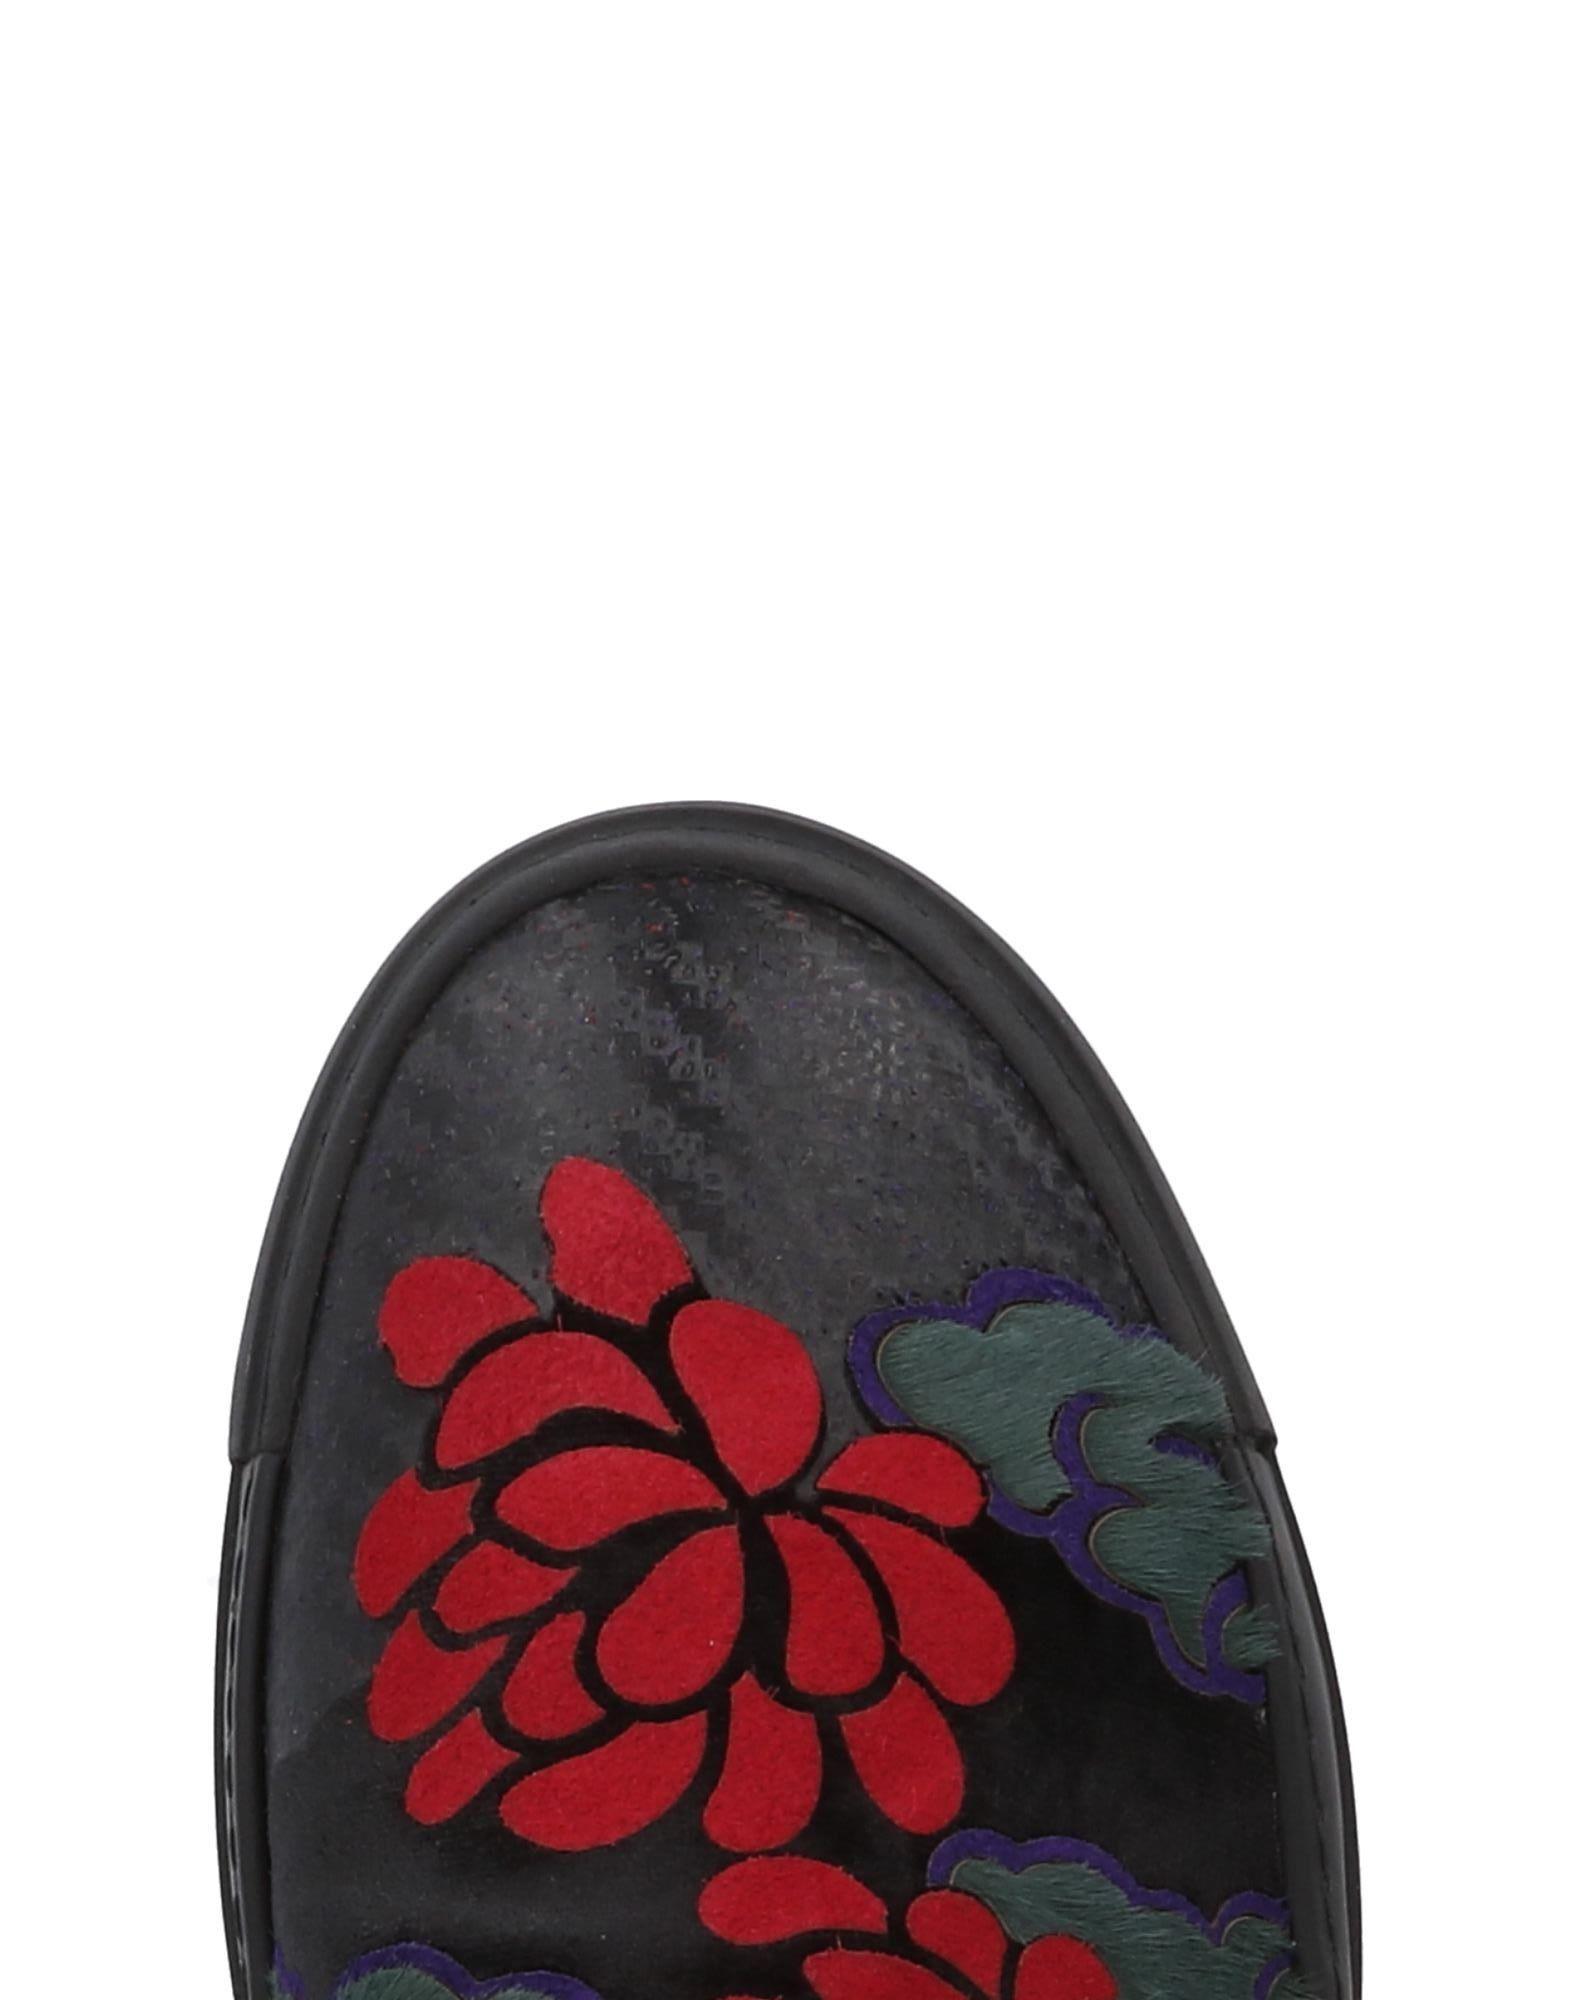 Vic Matié Velvet Low-tops & Sneakers in Black